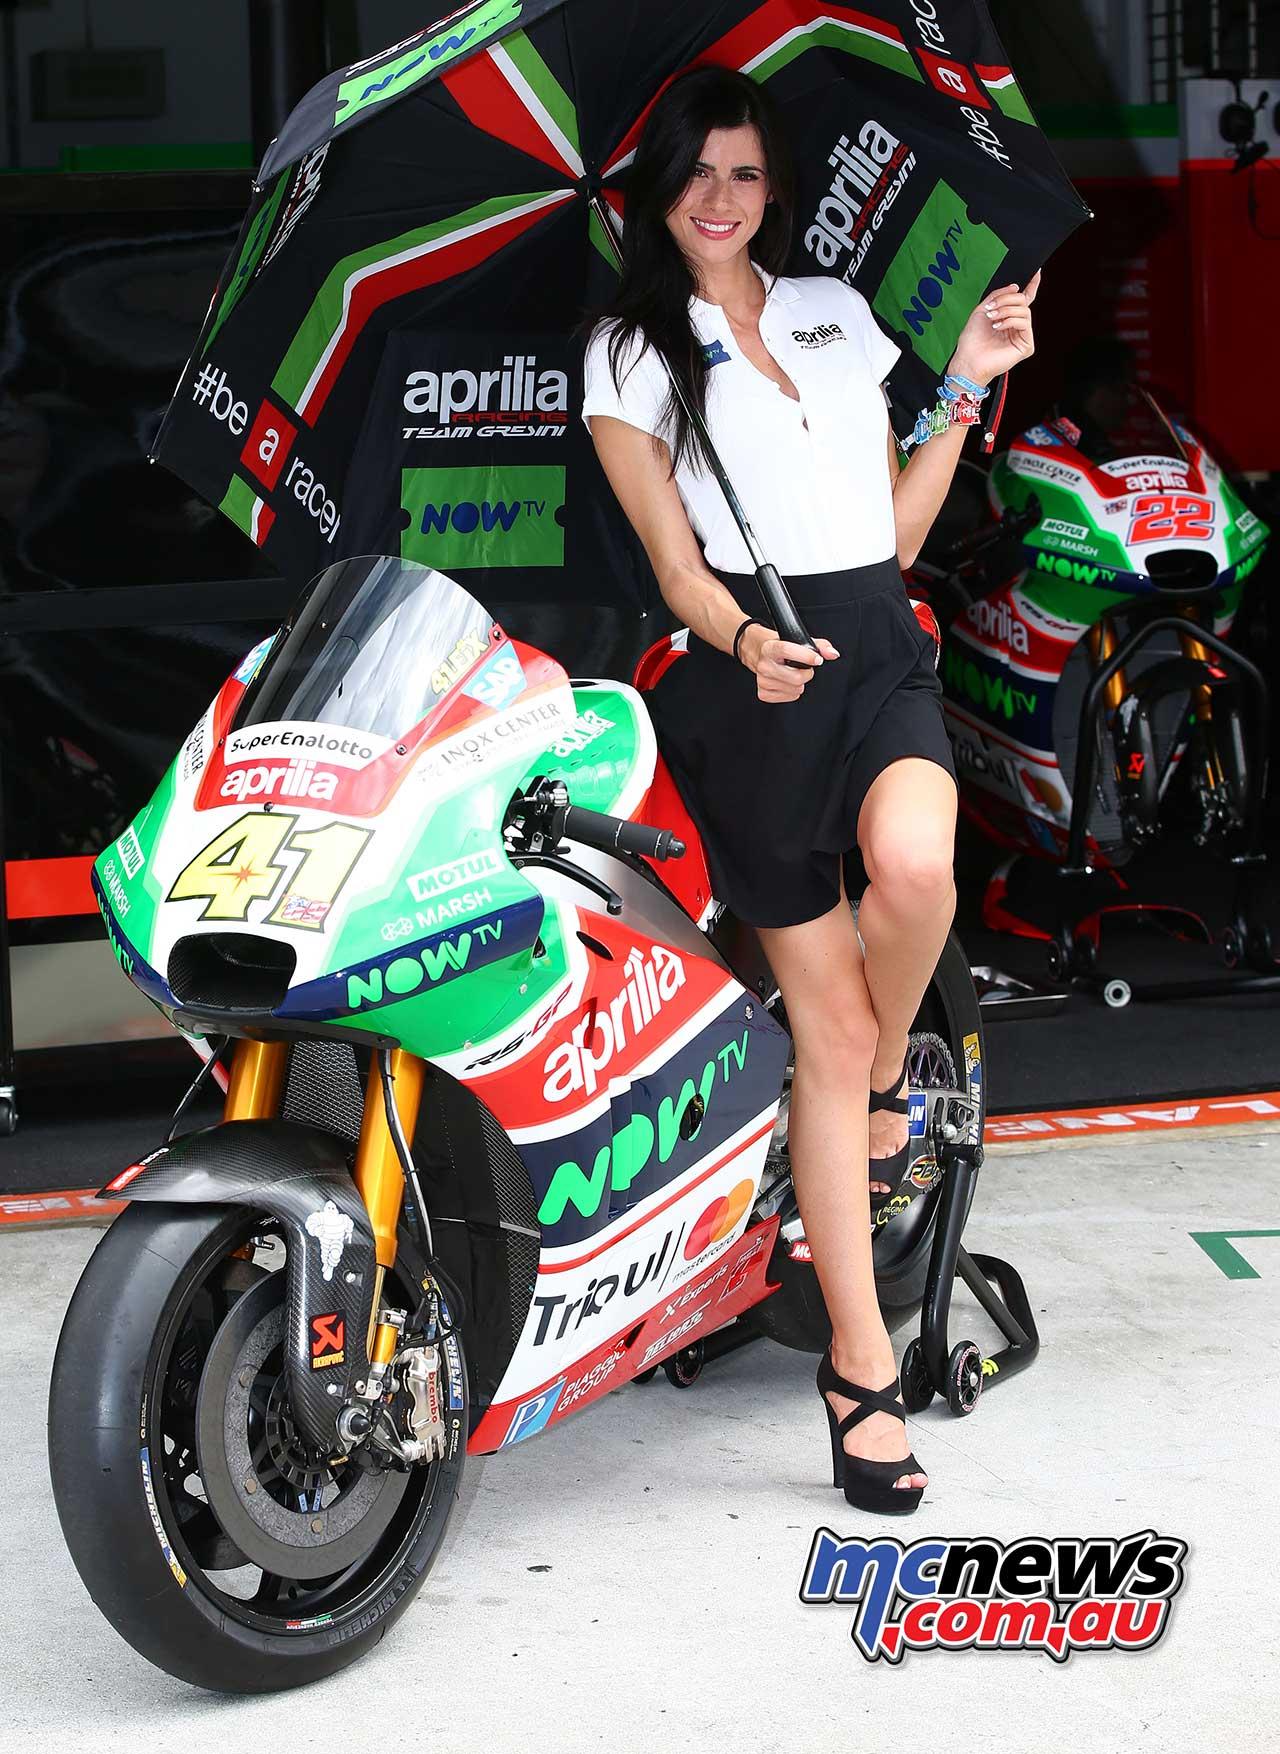 2017 Sepang MotoGP Grid Girls | MCNews.com.au